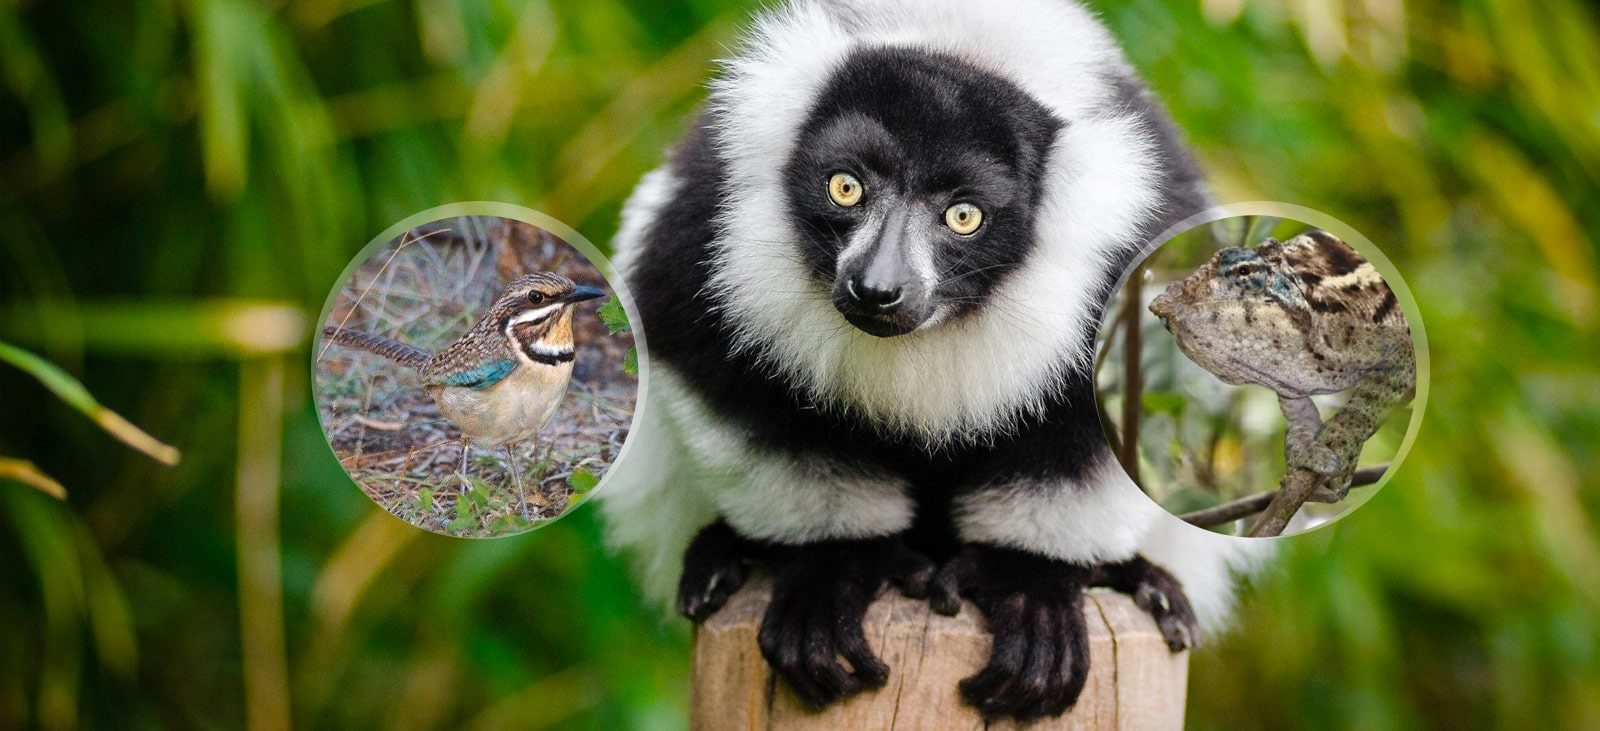 All inclusive madagascar vacation Wildlife tour